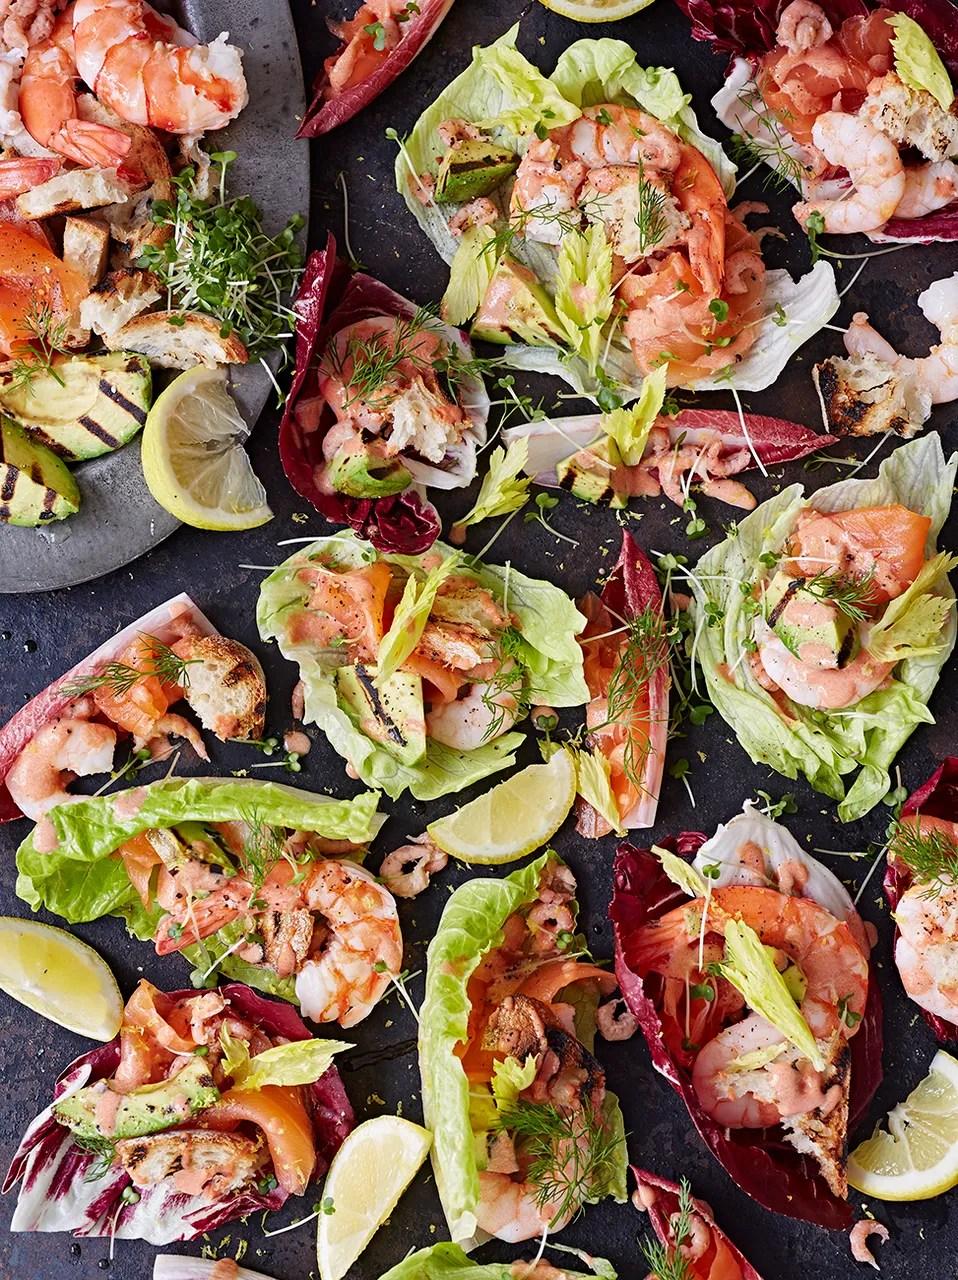 Christmas Seafood Platter Recipes : christmas, seafood, platter, recipes, Bloody, Seafood, Platter, Recipes, Jamie, Oliver